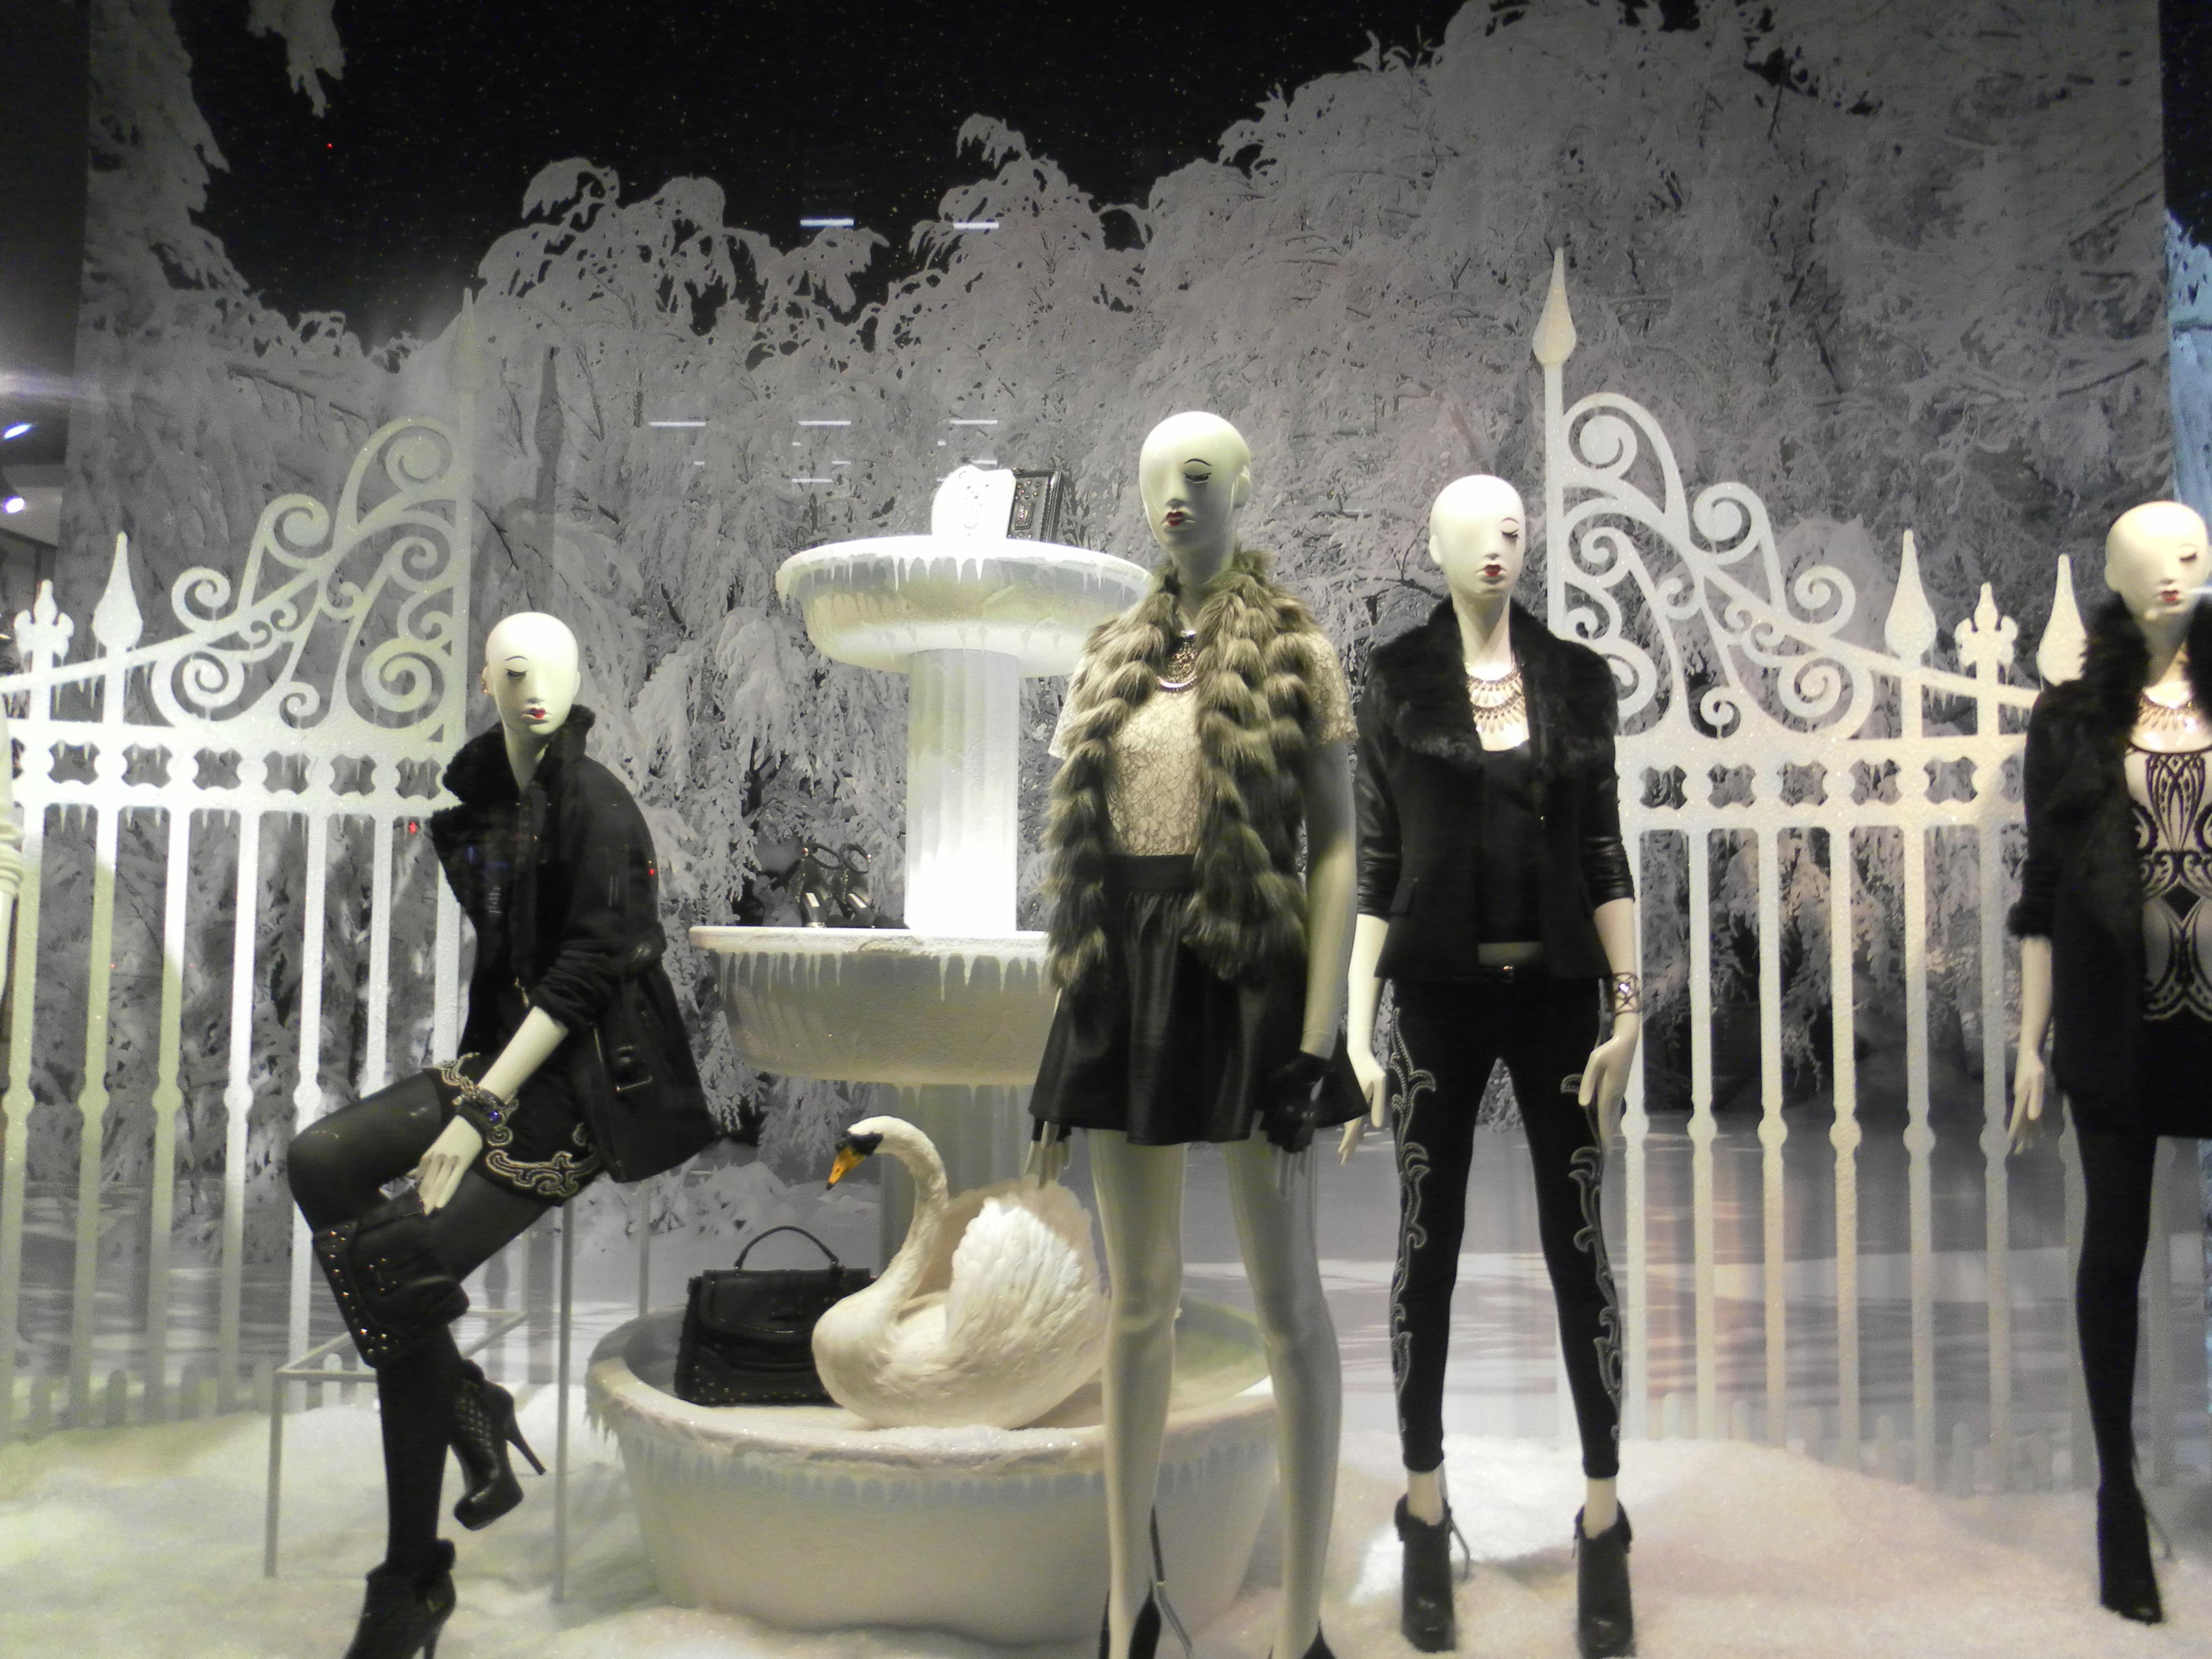 9f8c248510af Fotos gratis : estatua, Moda, ropa, juguete, Ventana de la tienda ...